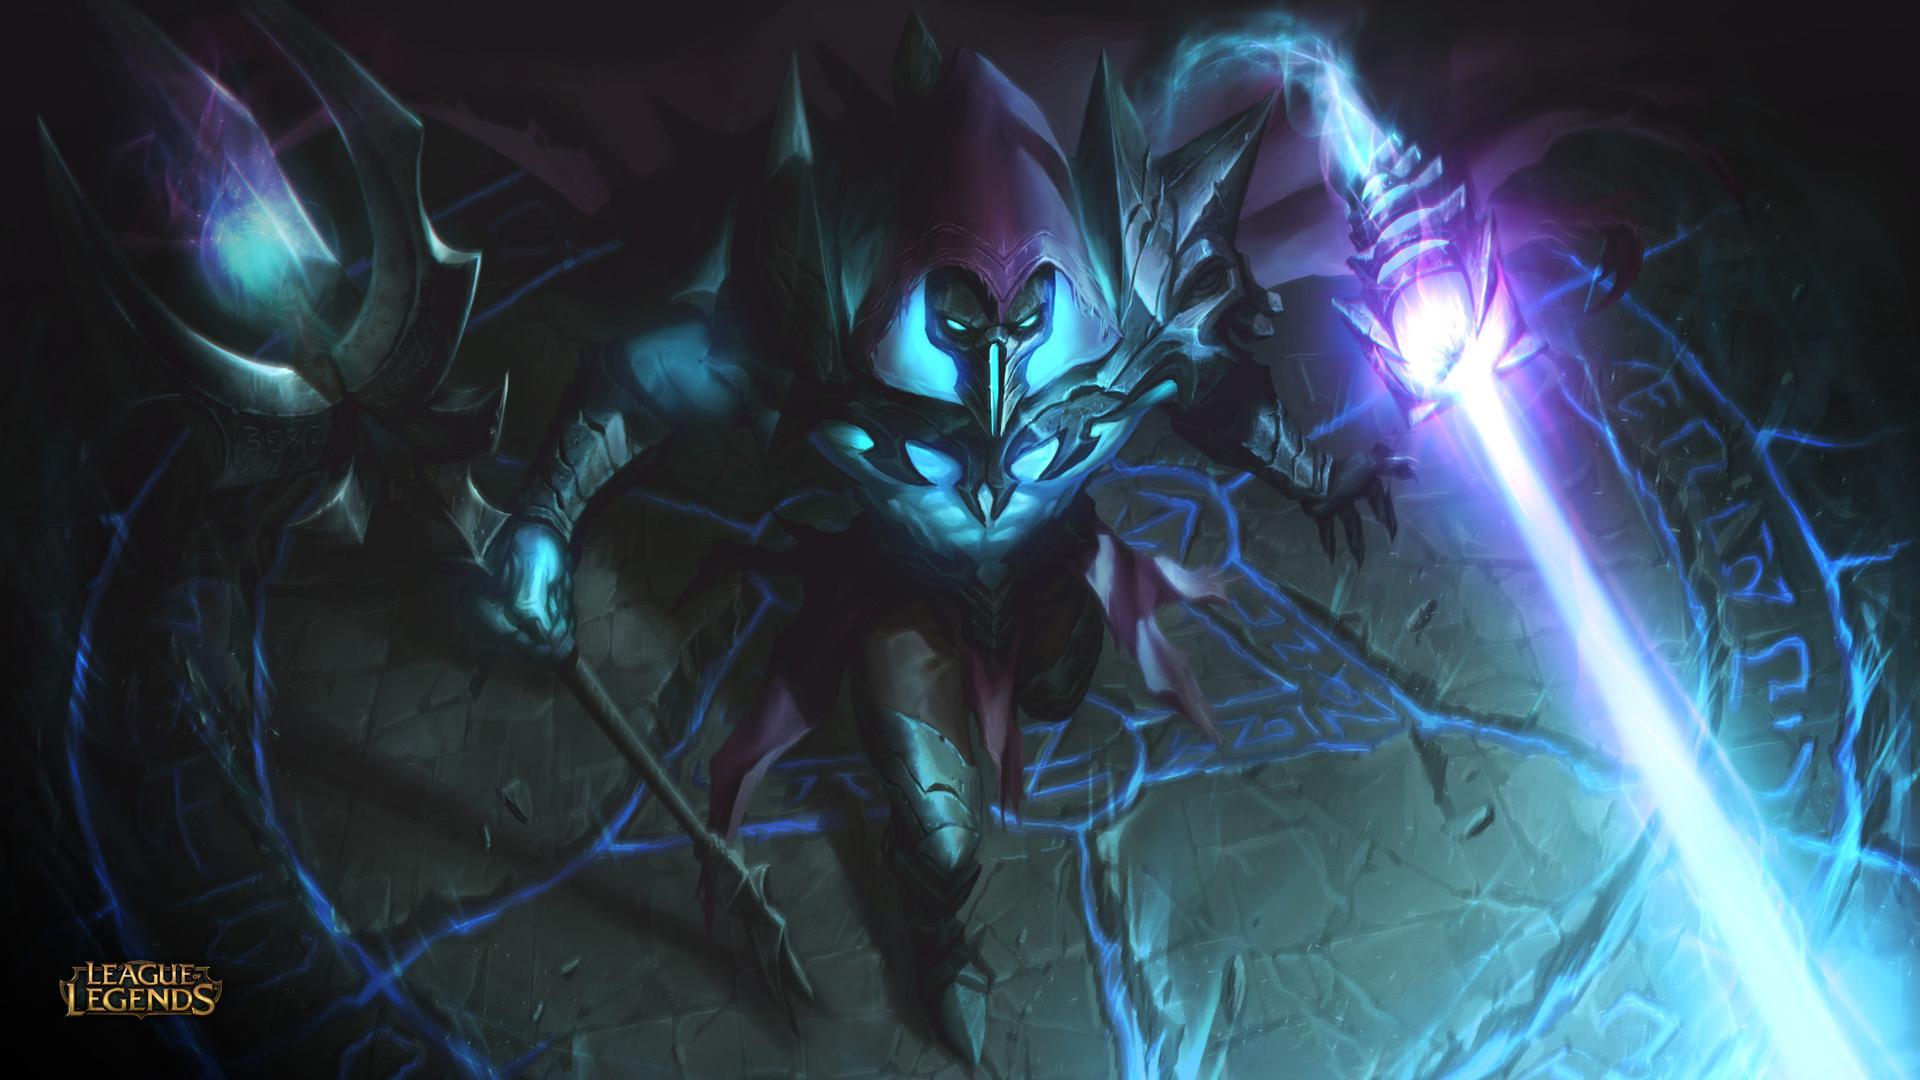 Masaüstü Efsaneler Ligi Summoners Rift Viktor League Of Legends